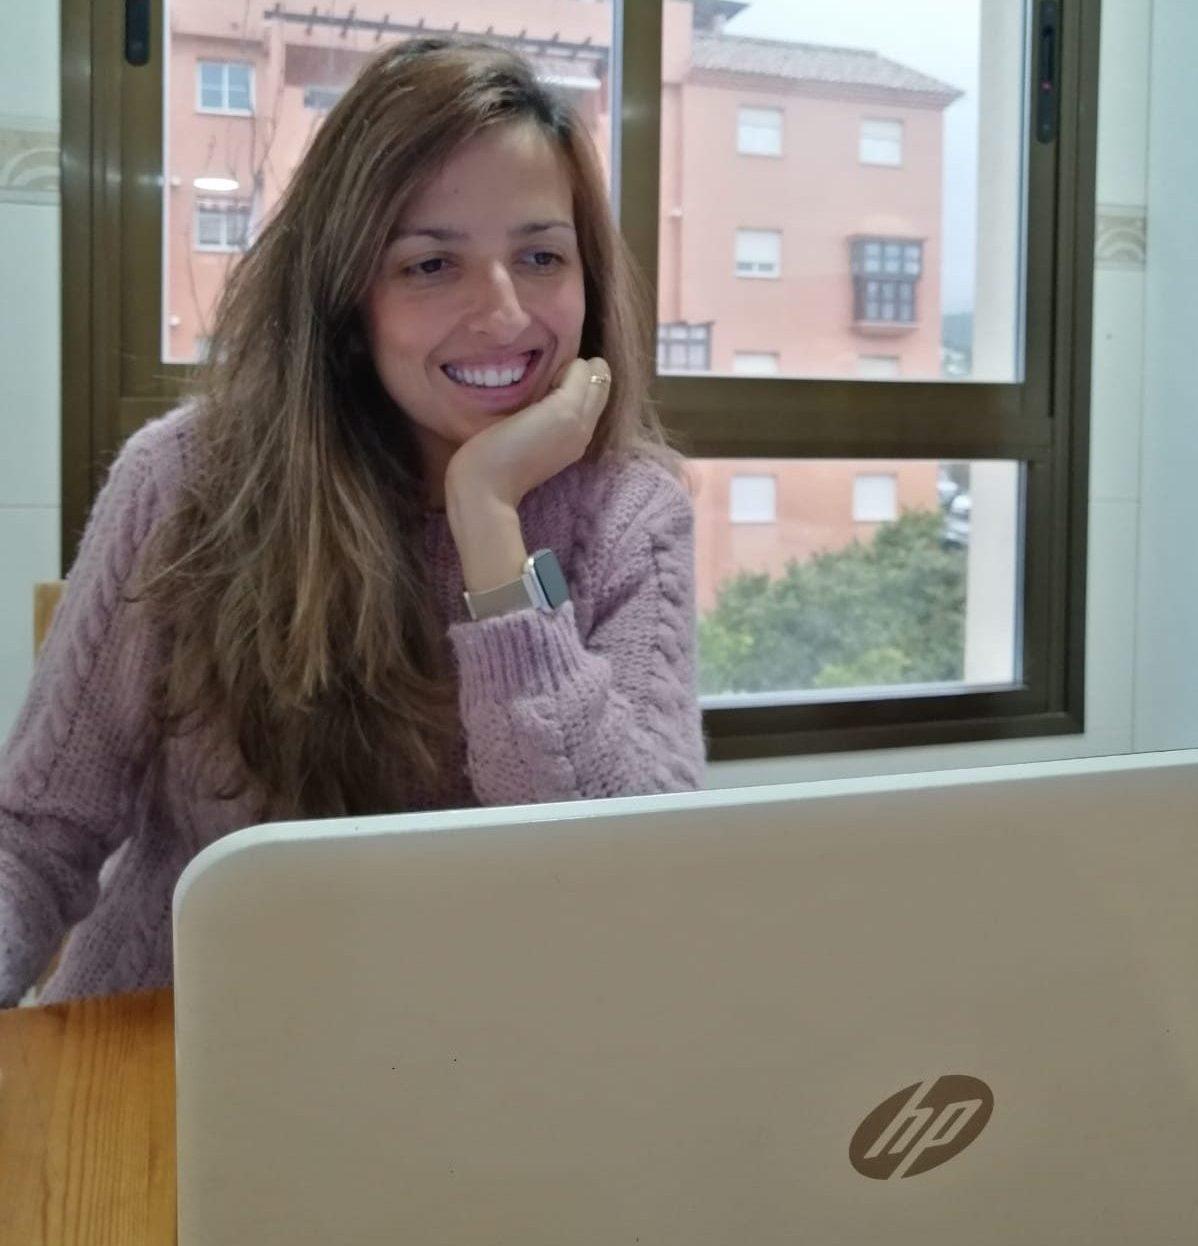 Cursus intensif d'espagnol online